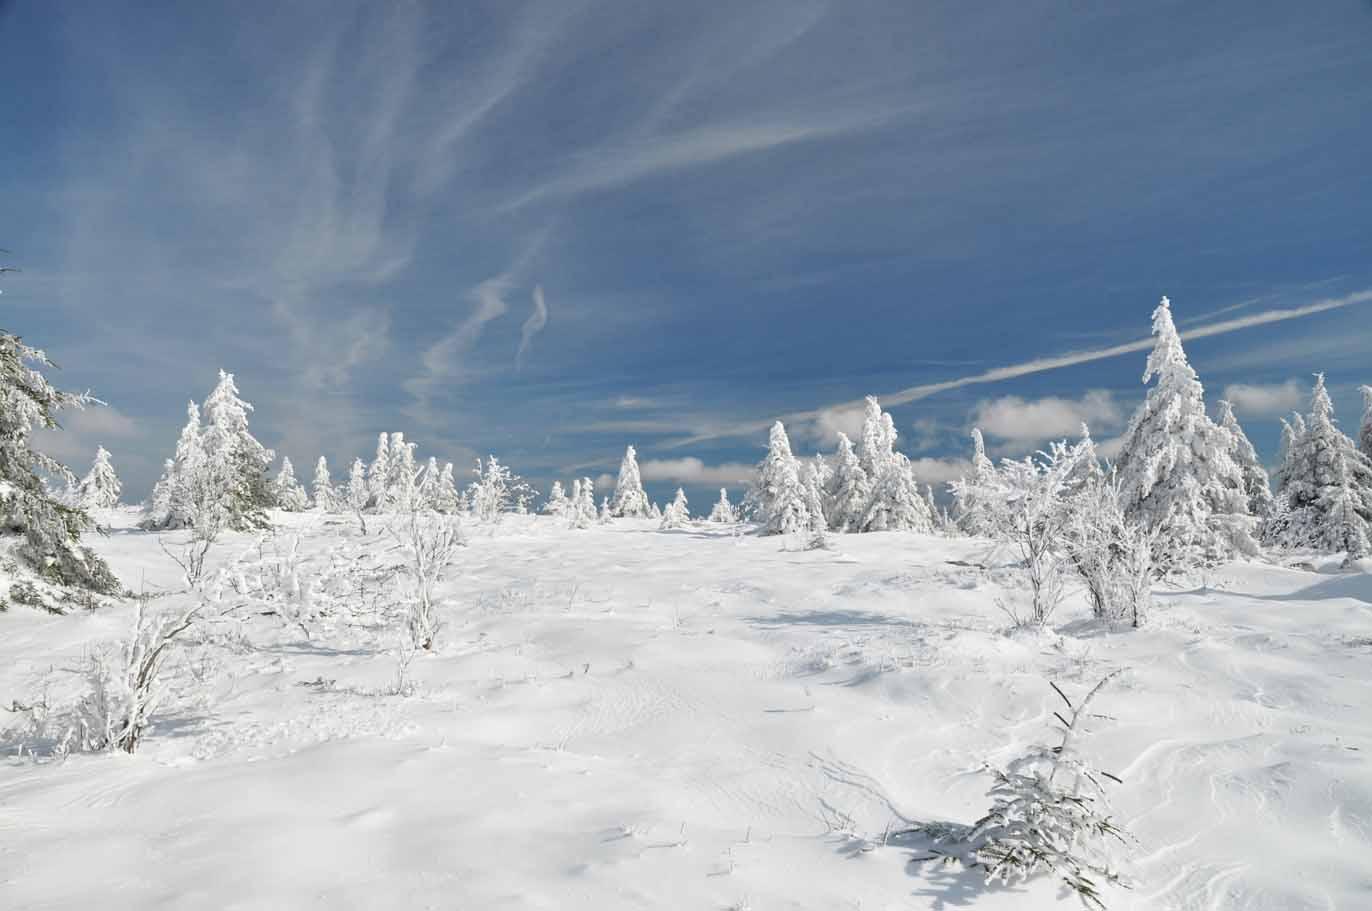 Winter in Dolly Sods